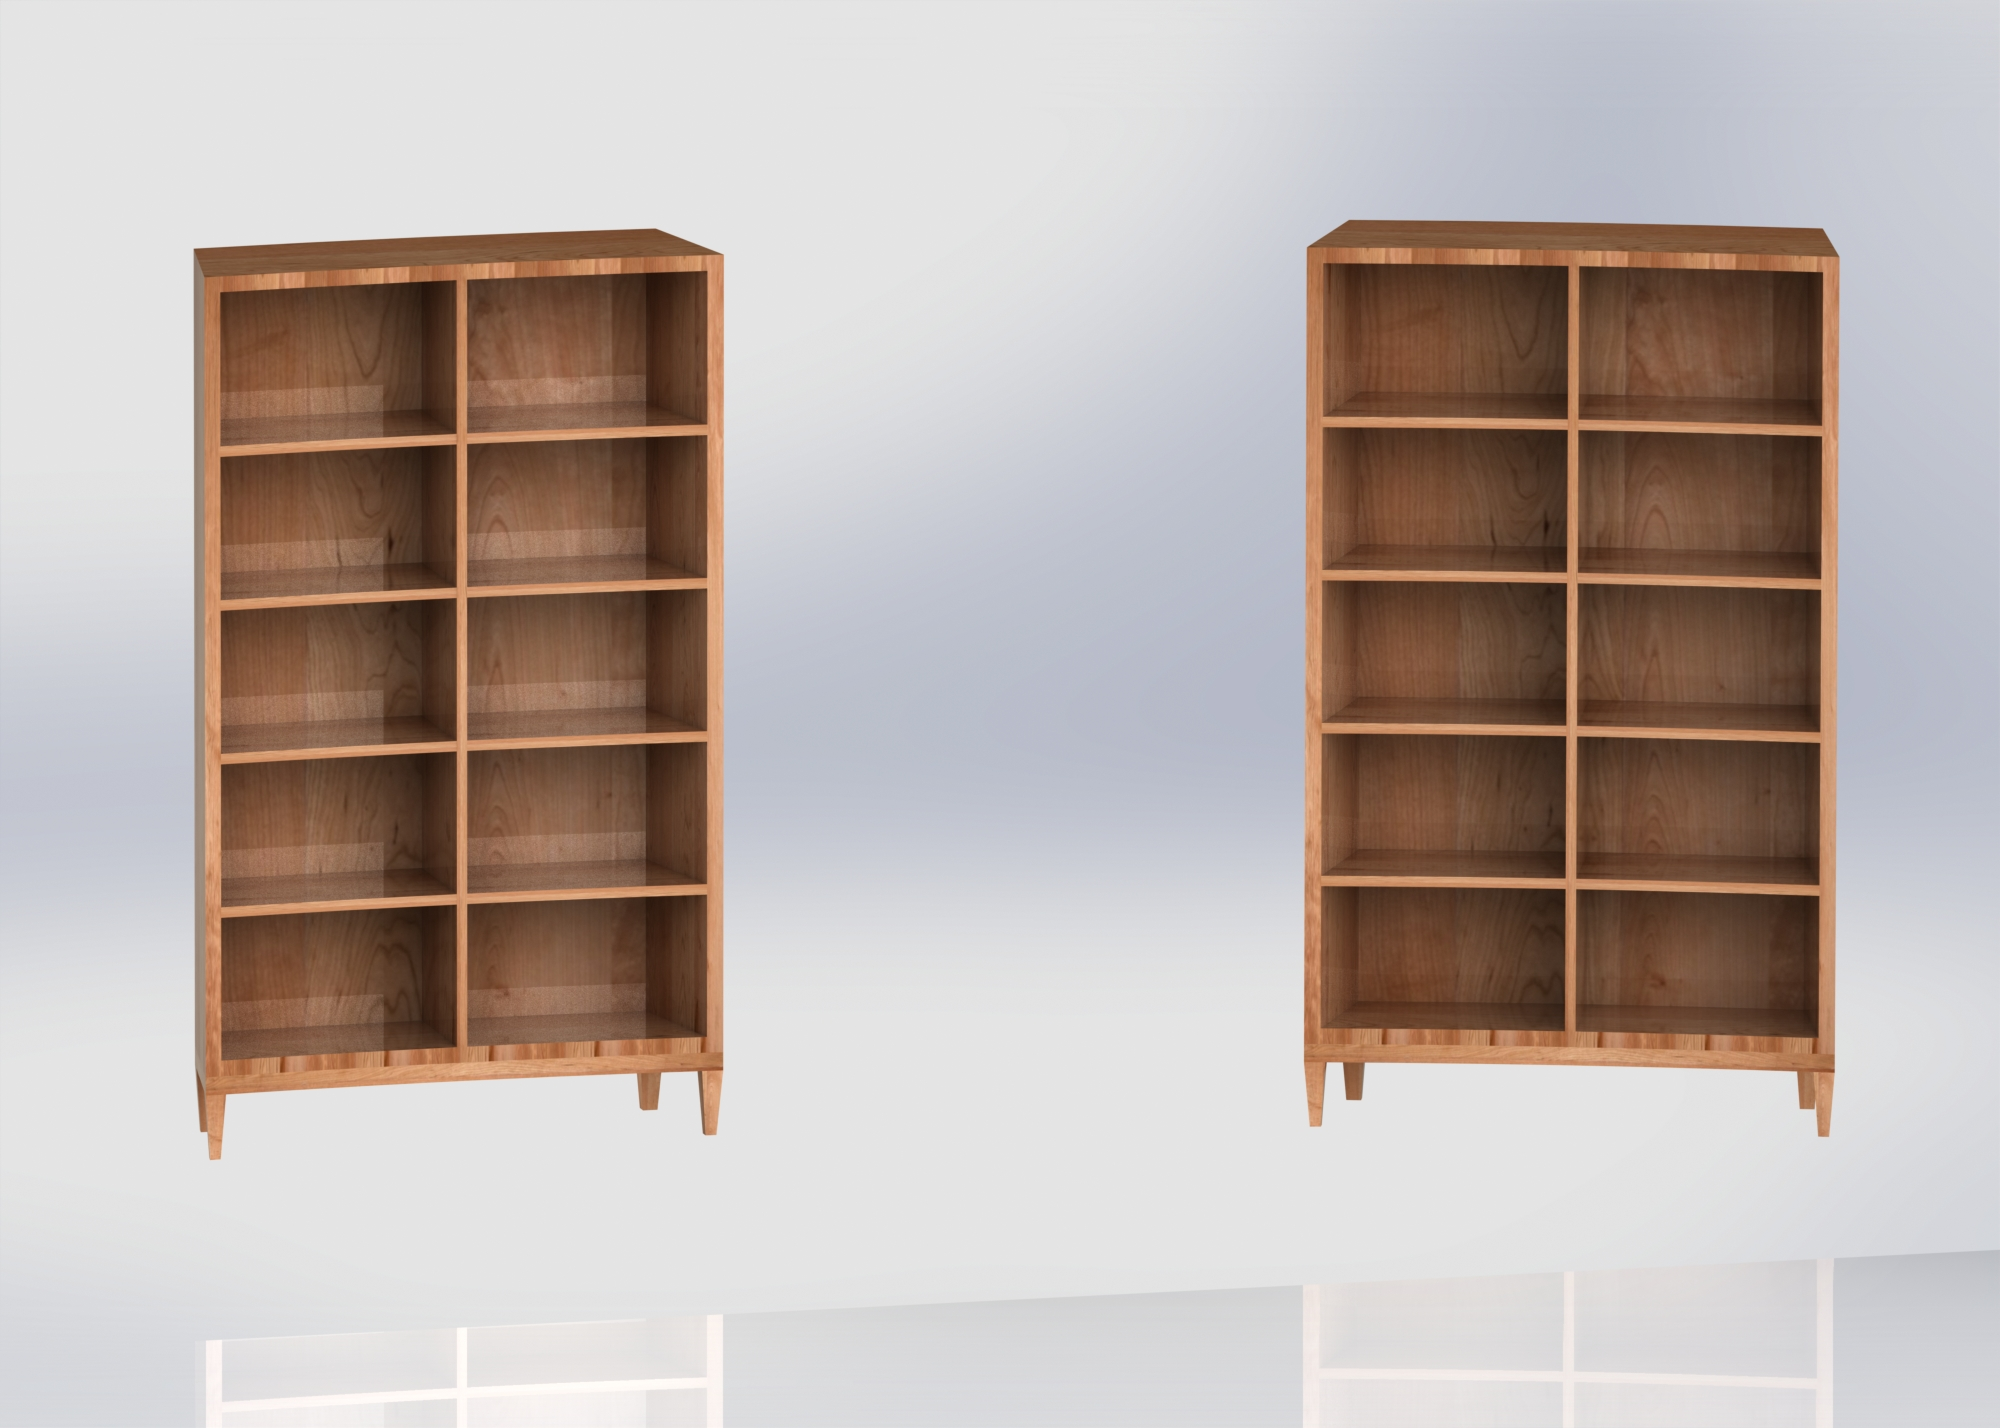 2_Part_Bookshelf_6.JPG